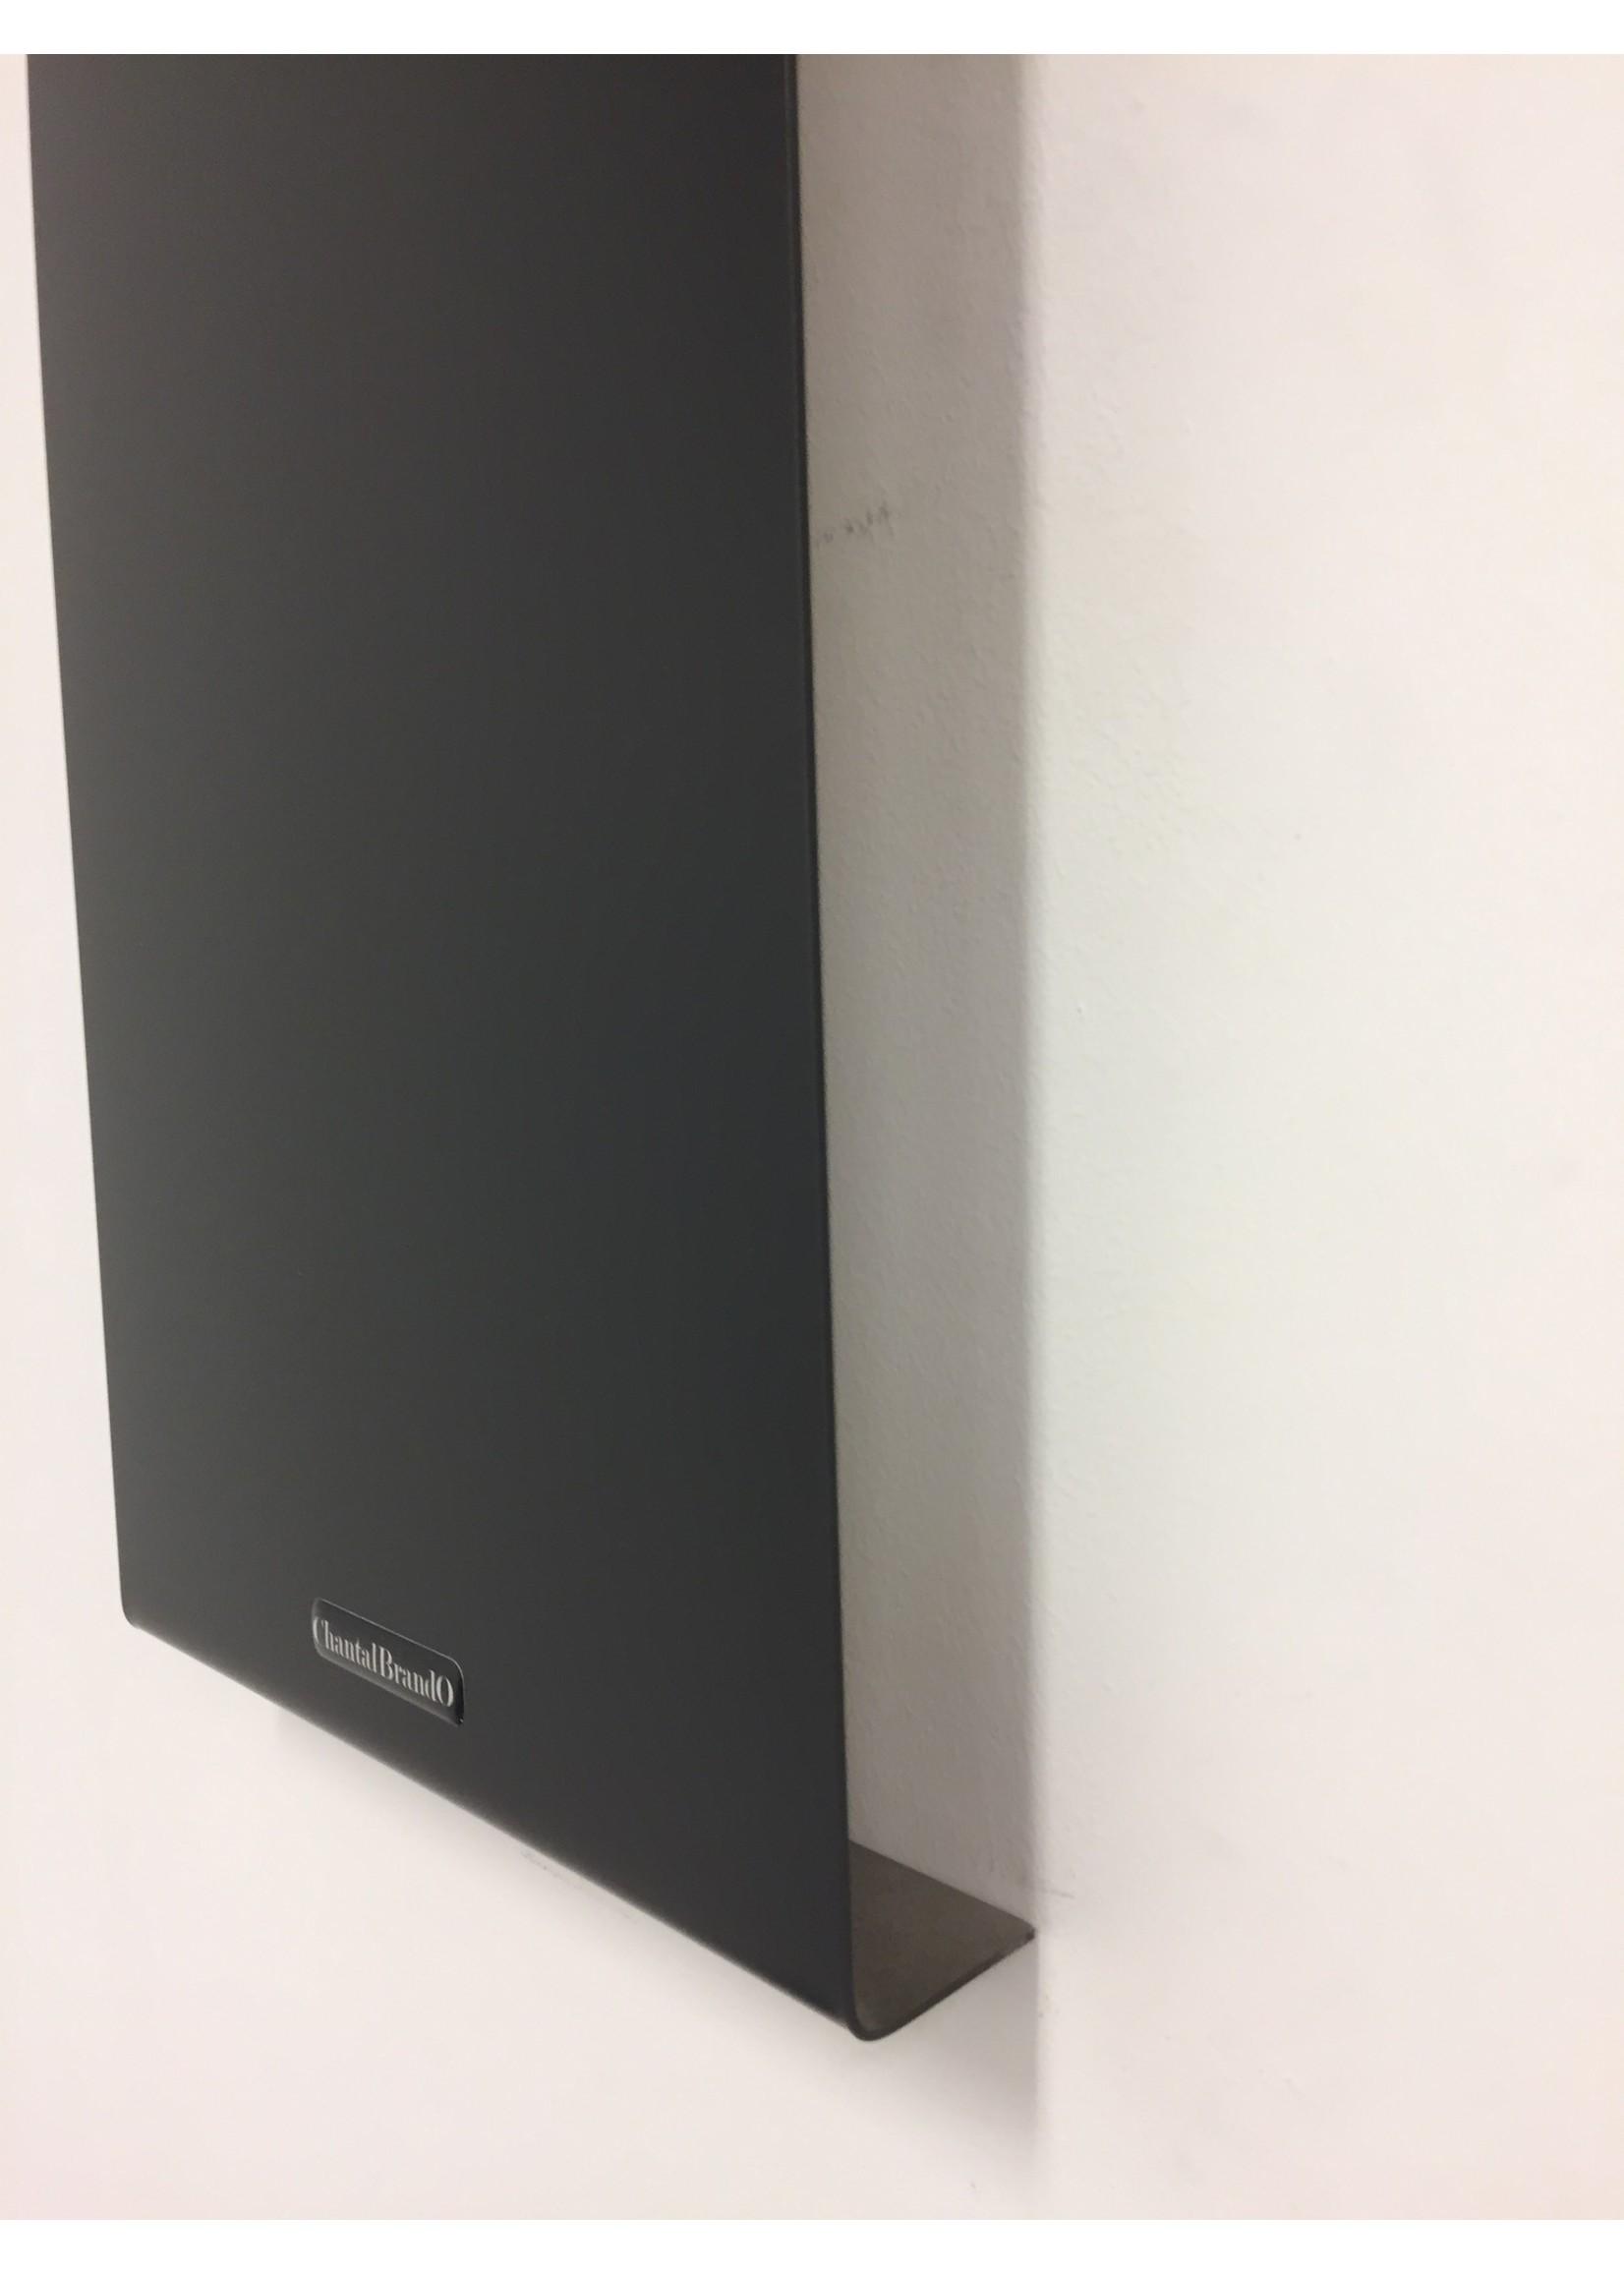 Klokkendiscounter Wandklok LaBrand Export Design Black & White Pointer Modern Dutch Design